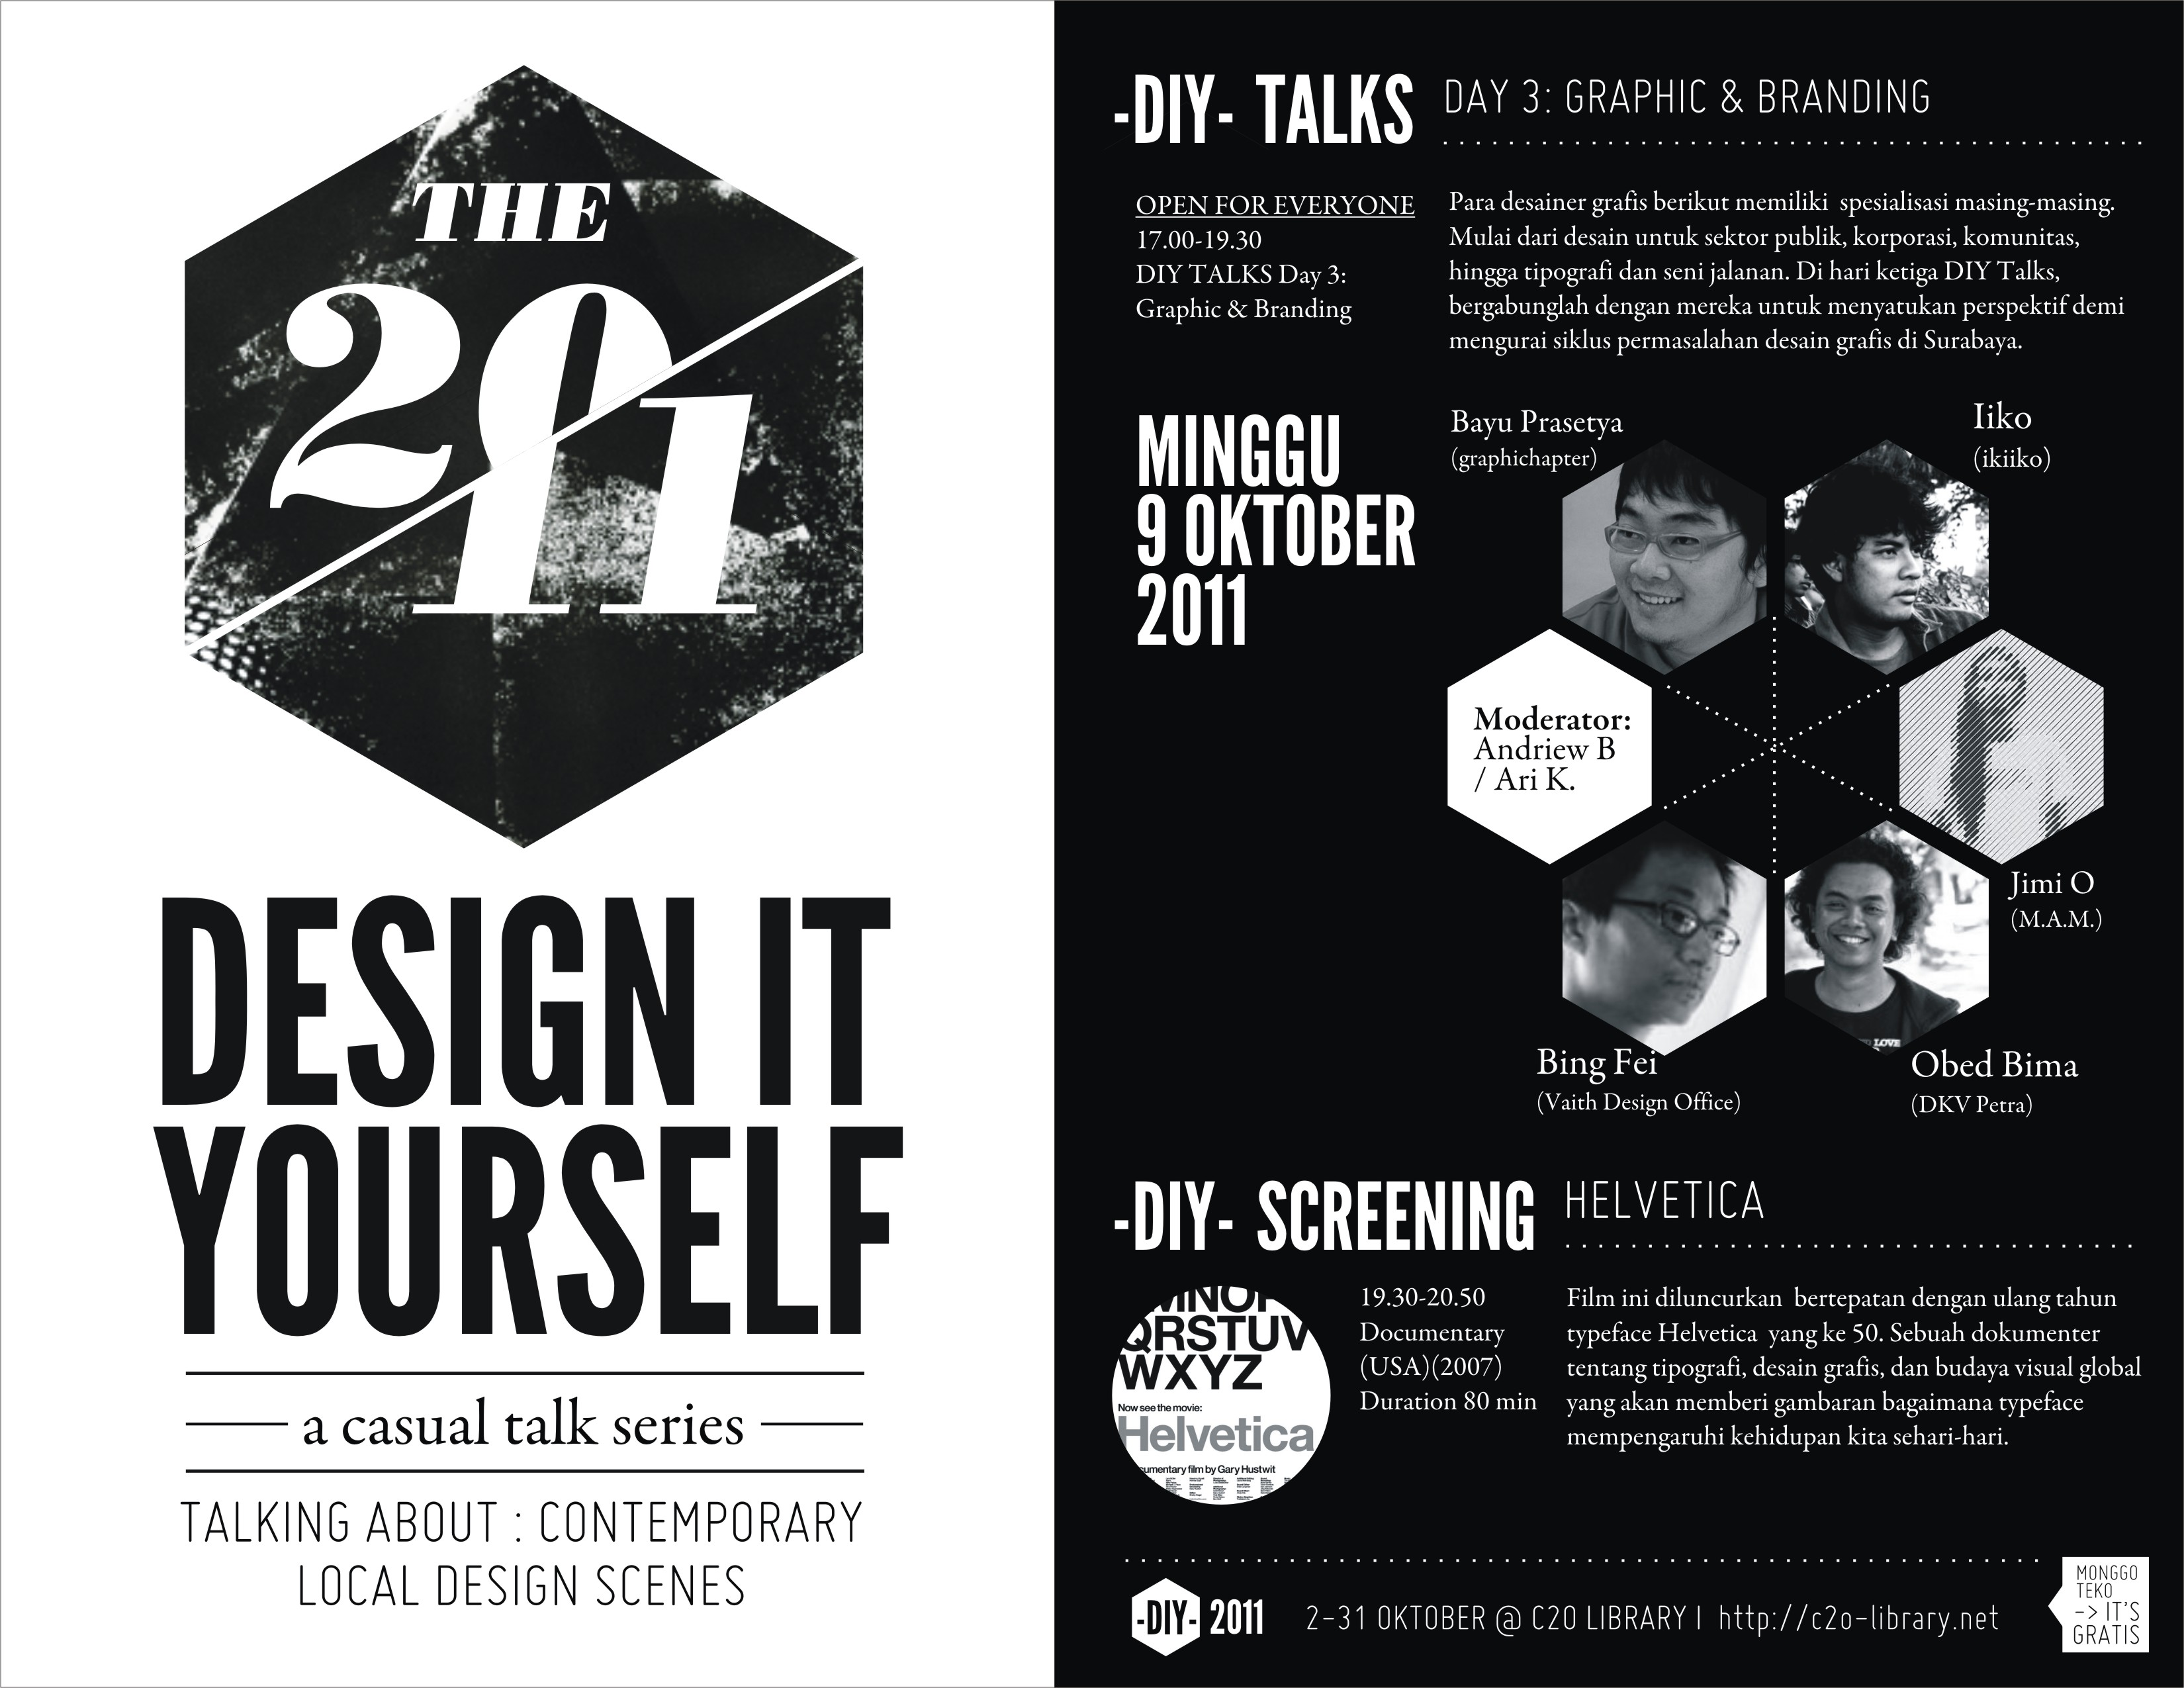 DIY Talk 3 Graphic & Branding Design It Yourself